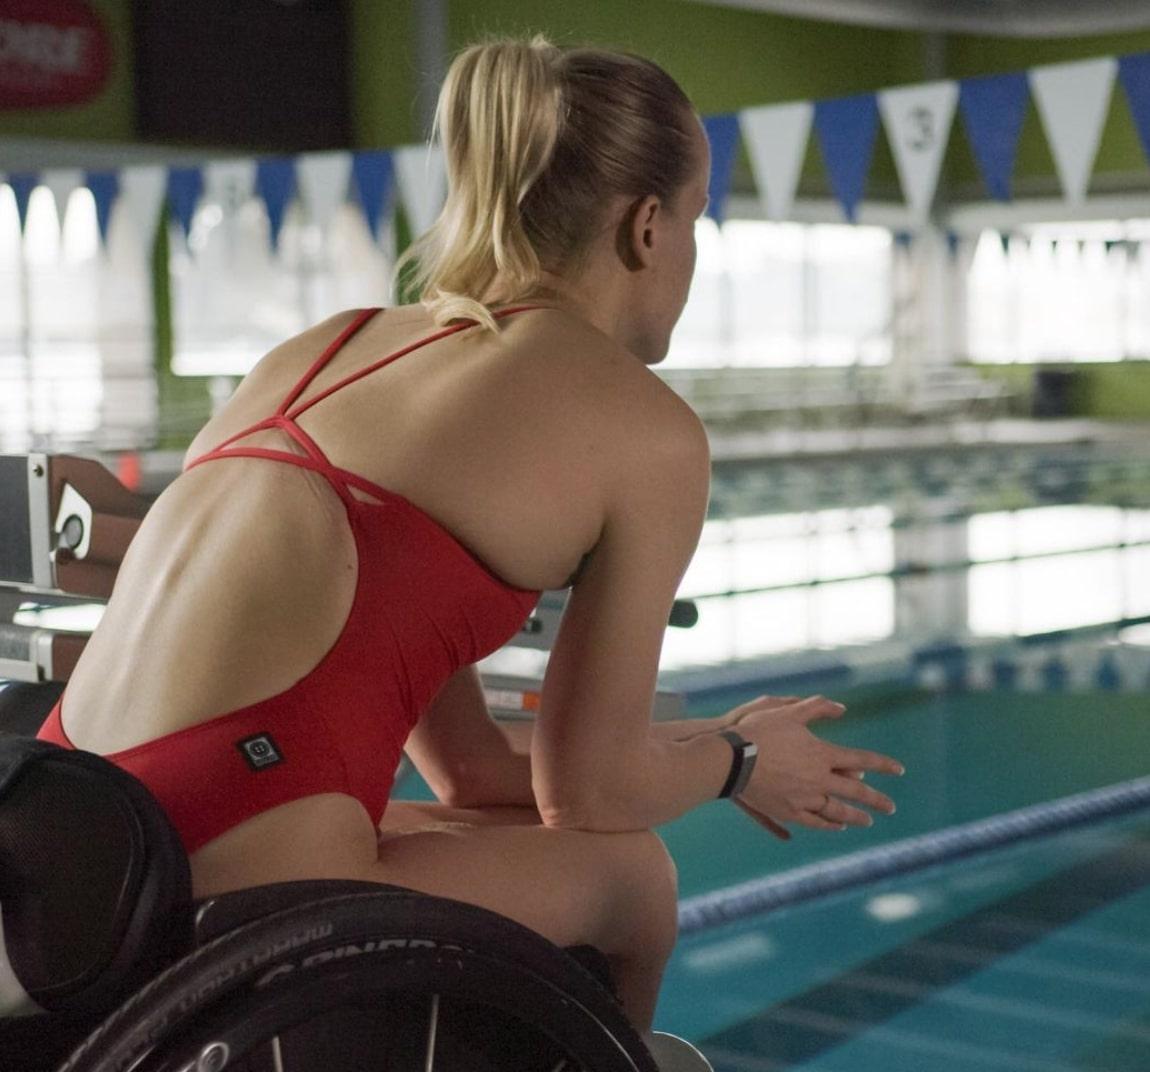 paralympic swimmer recalls moment she felt epidural paralyze